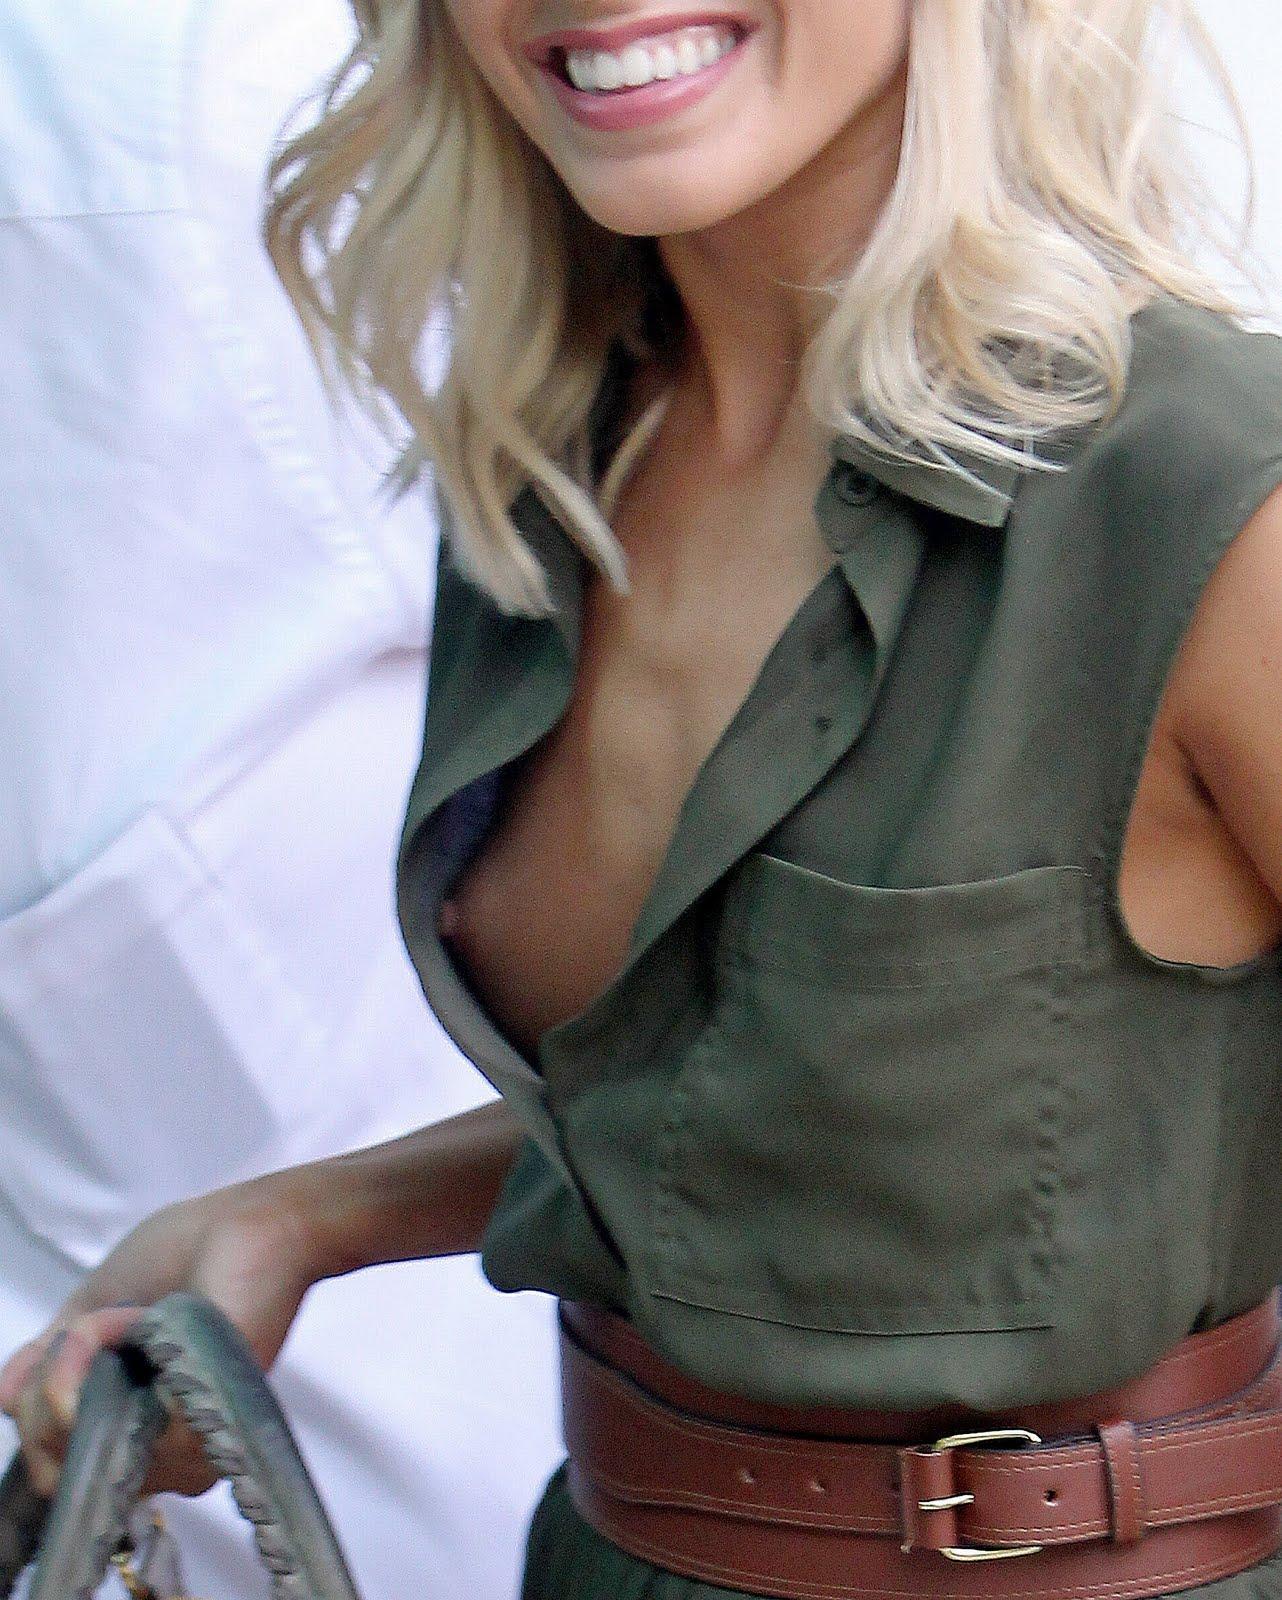 AbsoluGirl  Oops  Videos de femmes nues sexy erotique en